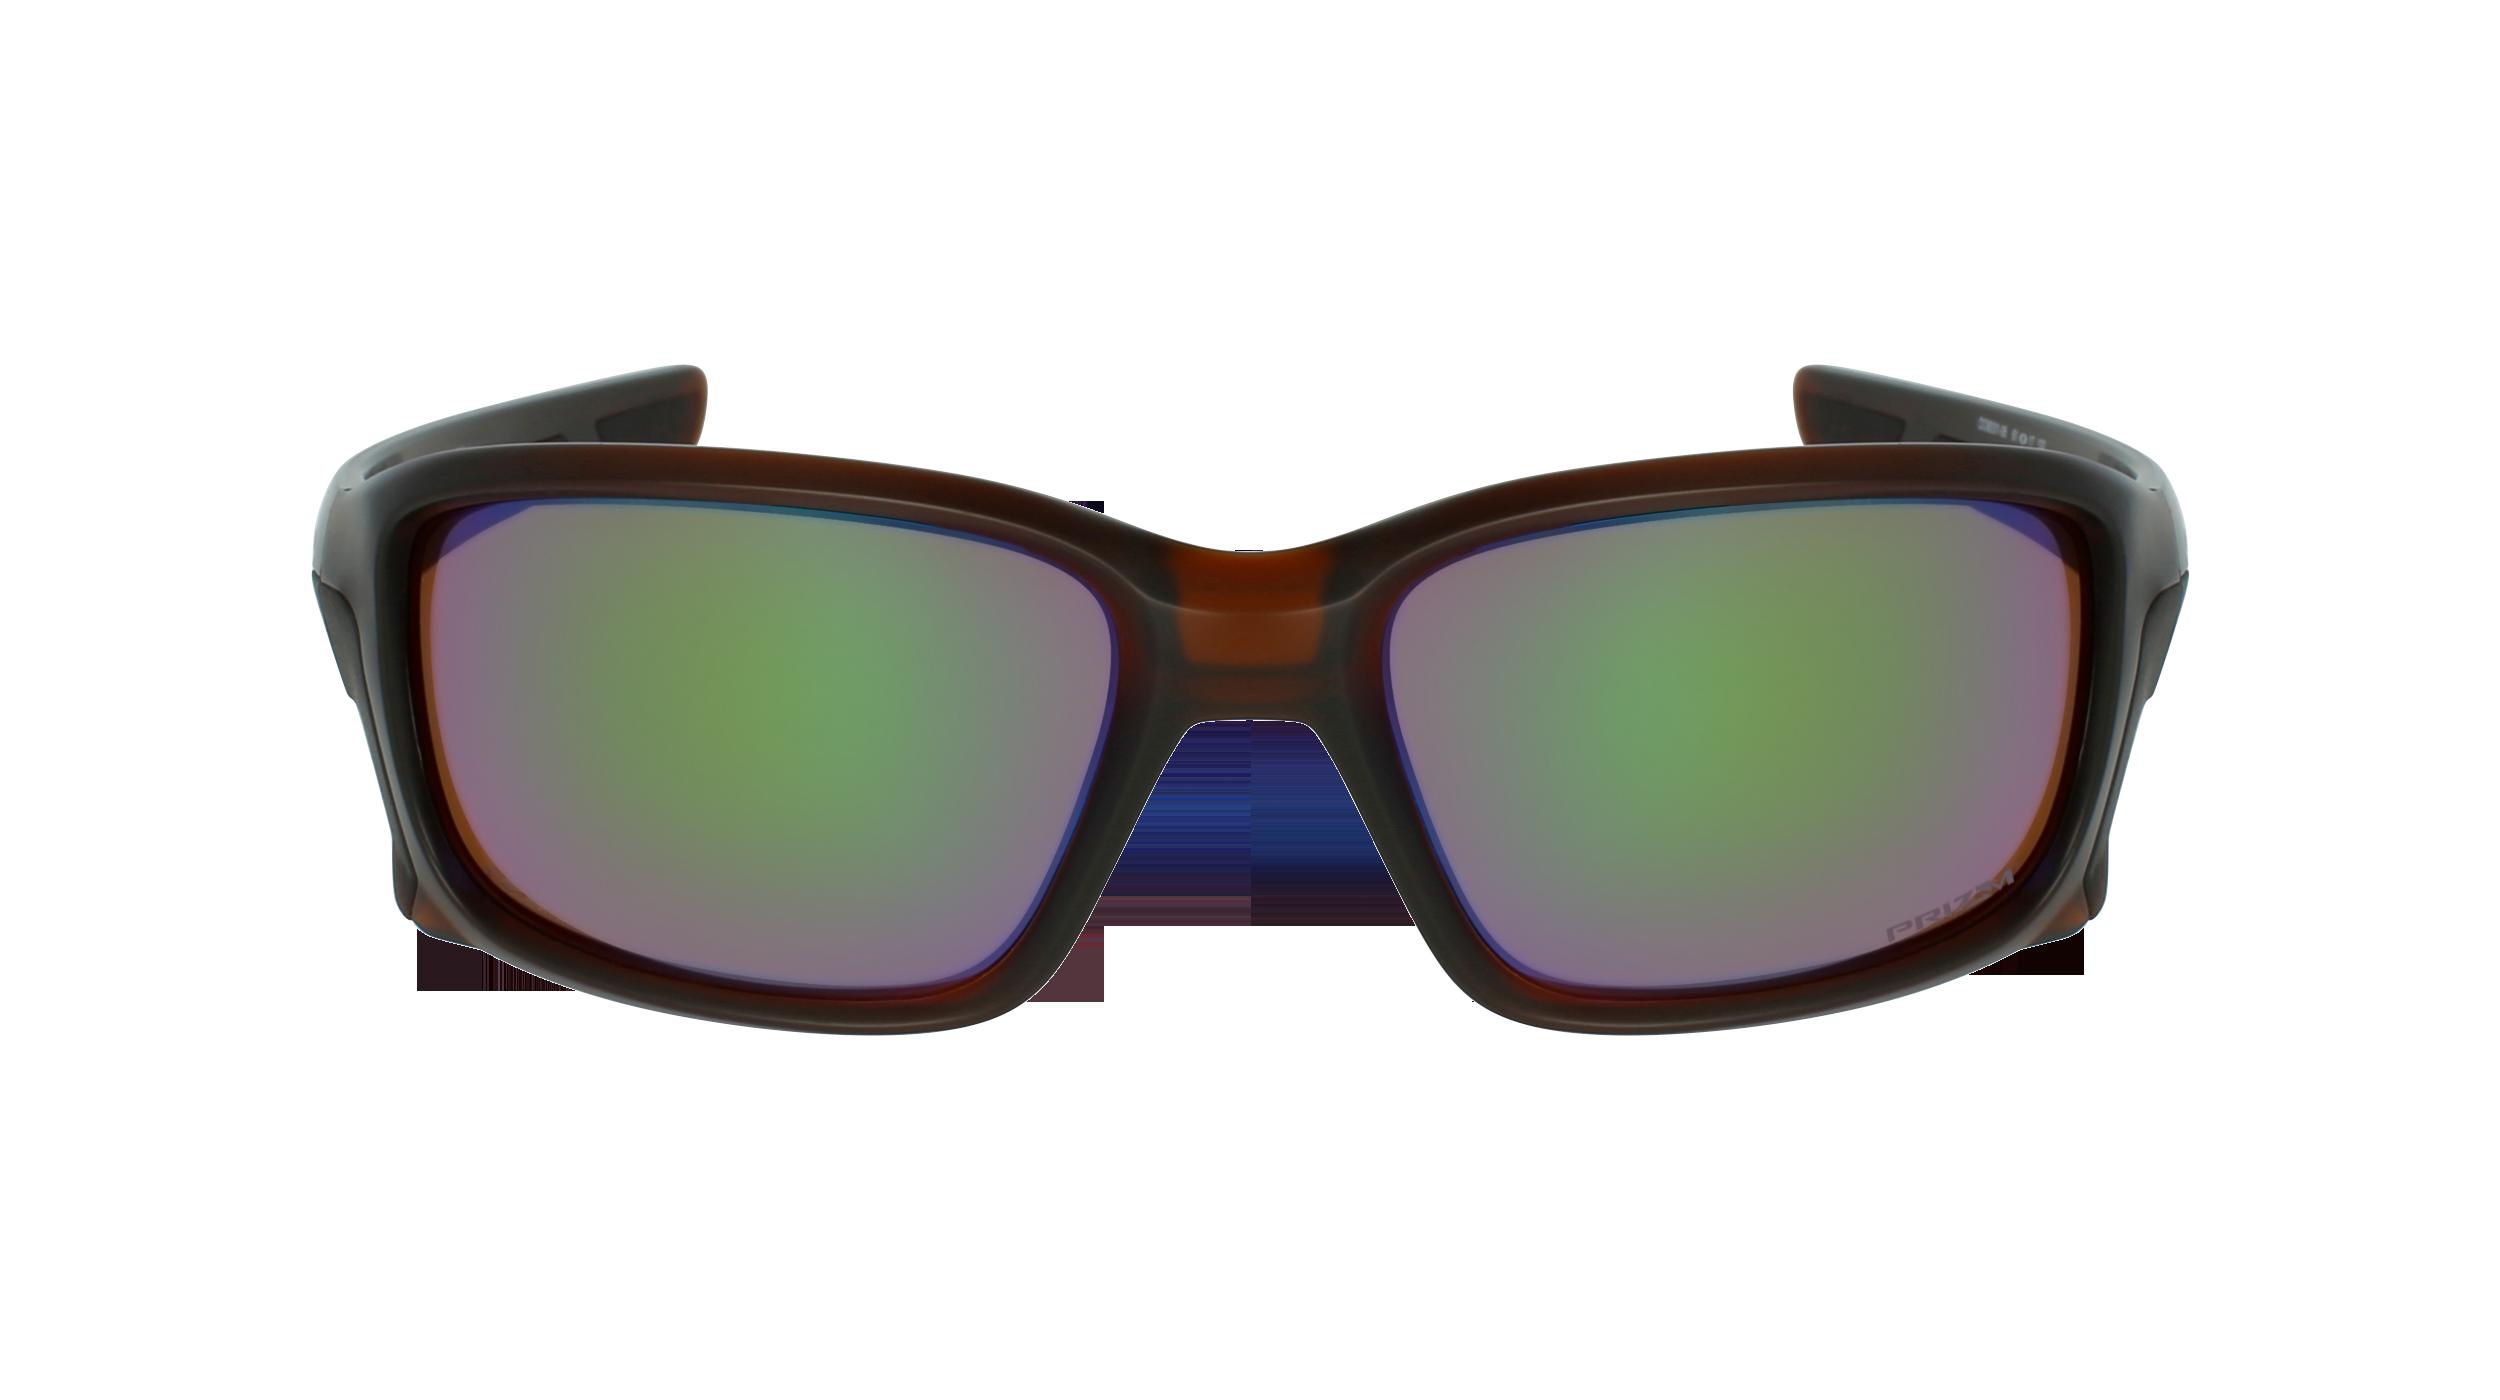 Optic2000 Lunettes Soleil Oakley